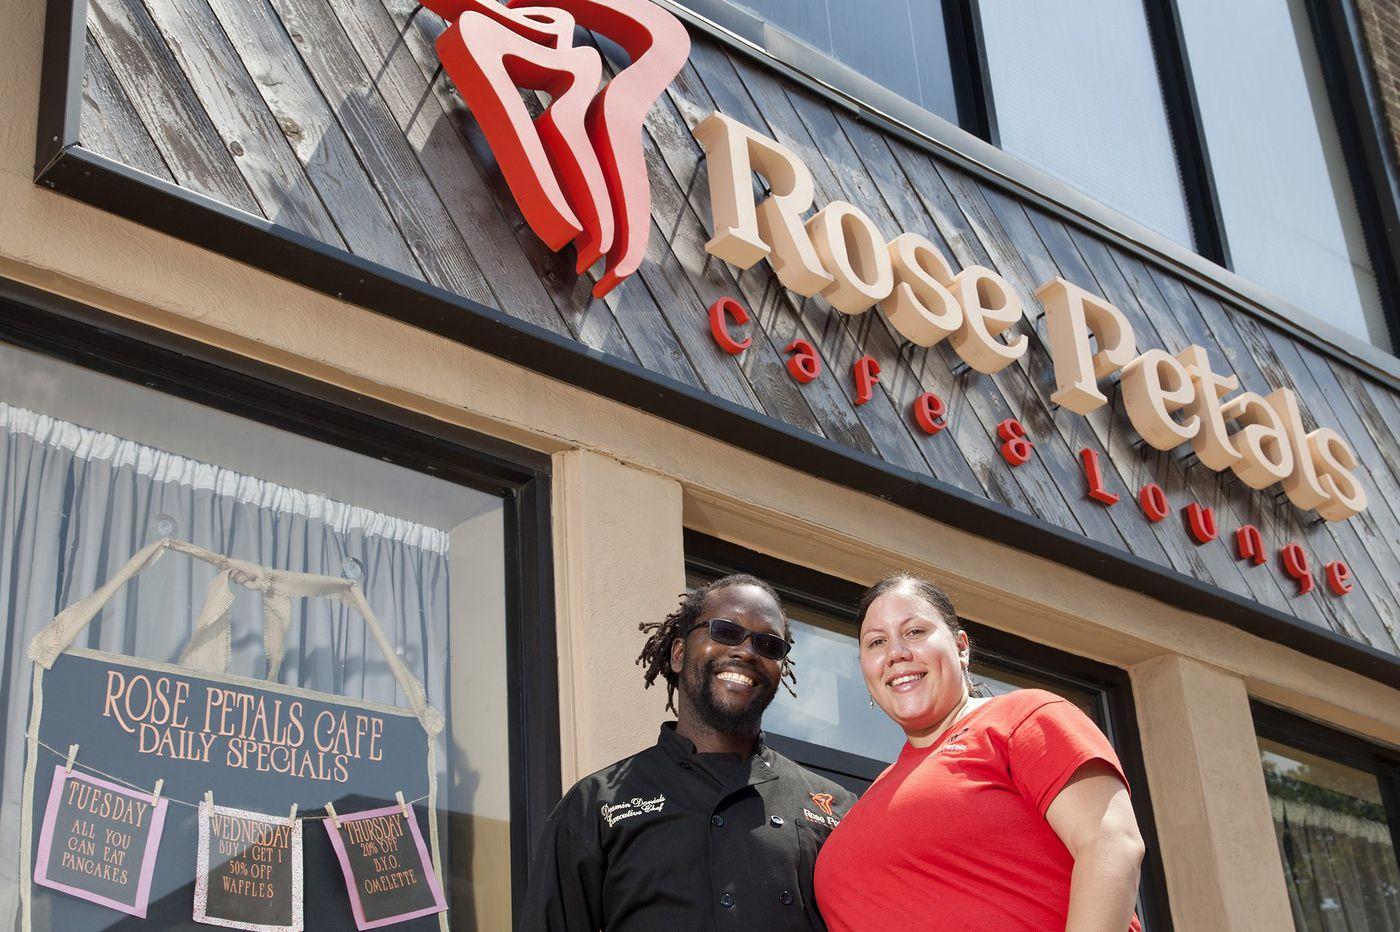 Rose Petals Cafe to open location in Elkins Park